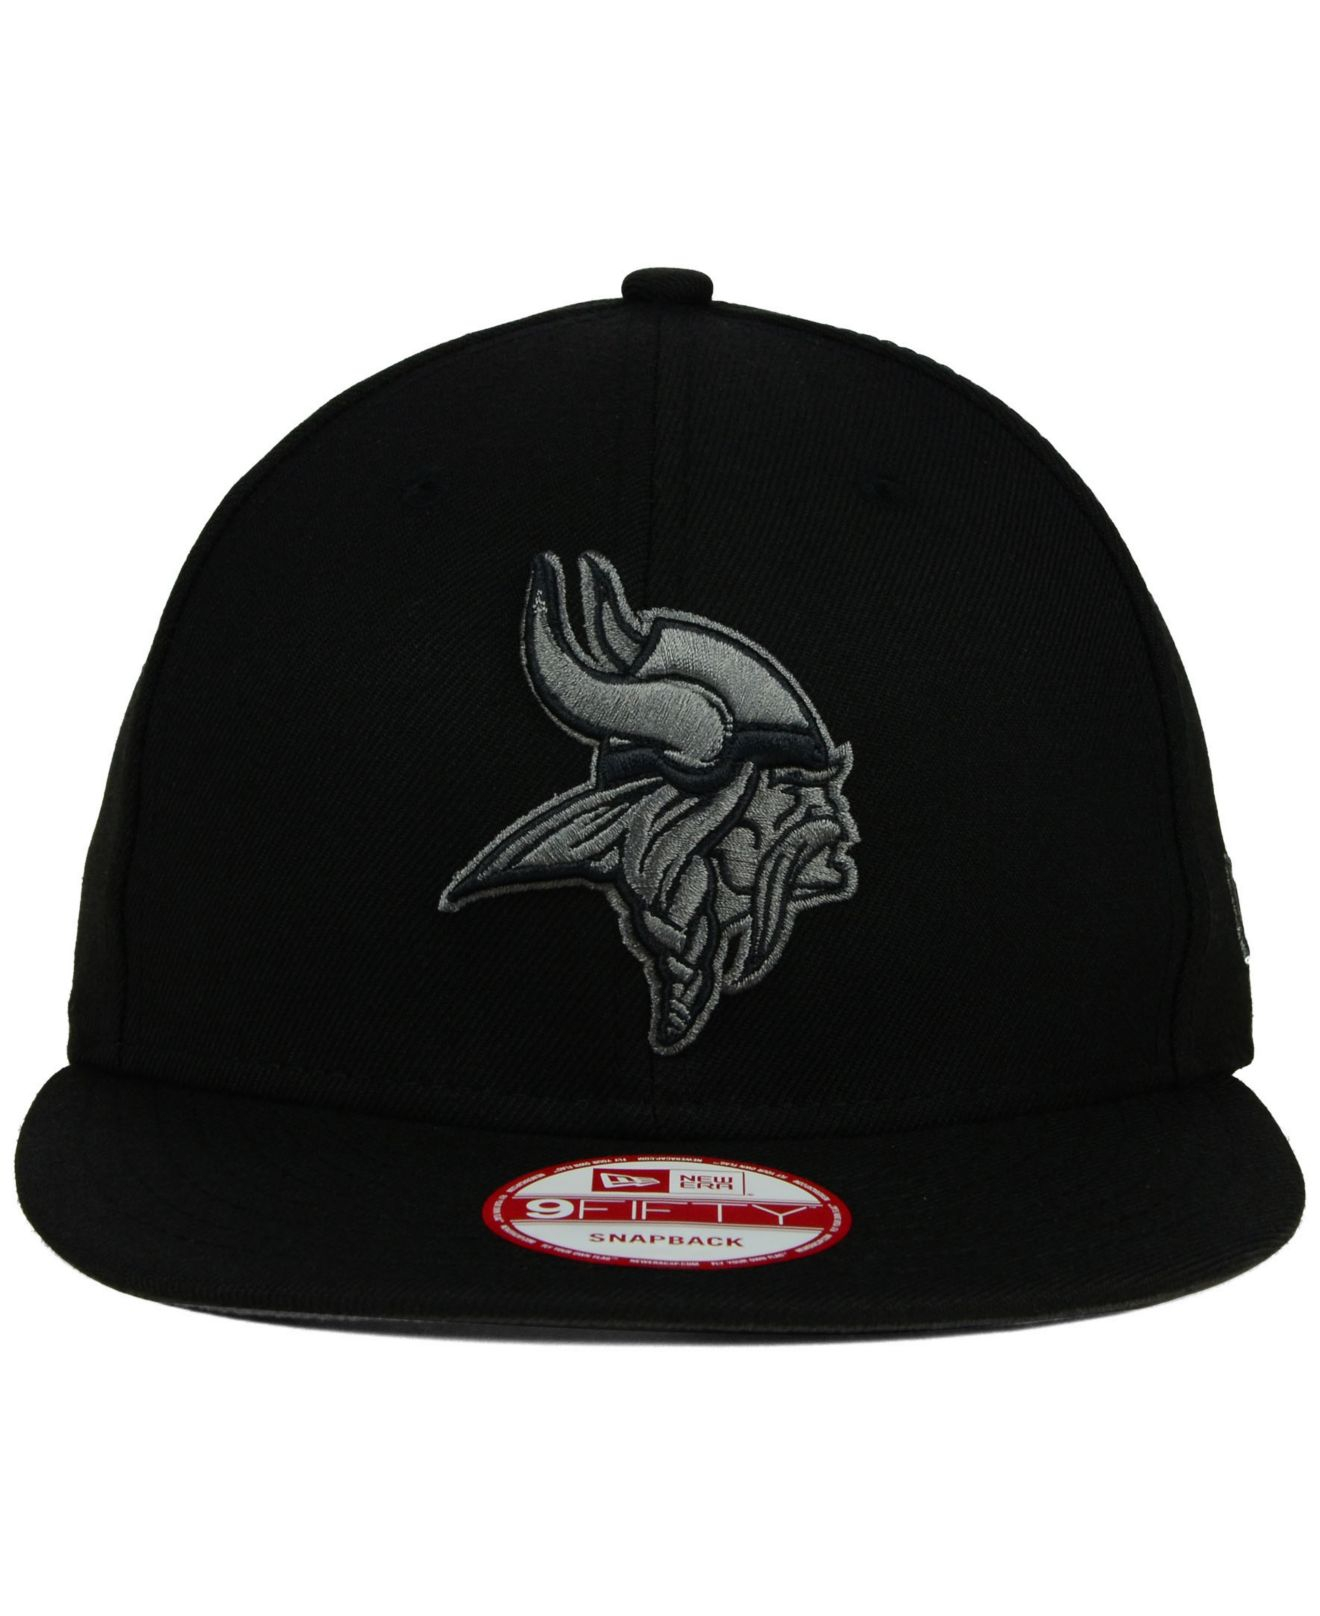 b674aca831daa ... where to buy lyst ktz minnesota vikings black gray 59fifty hat in black  4340d de577